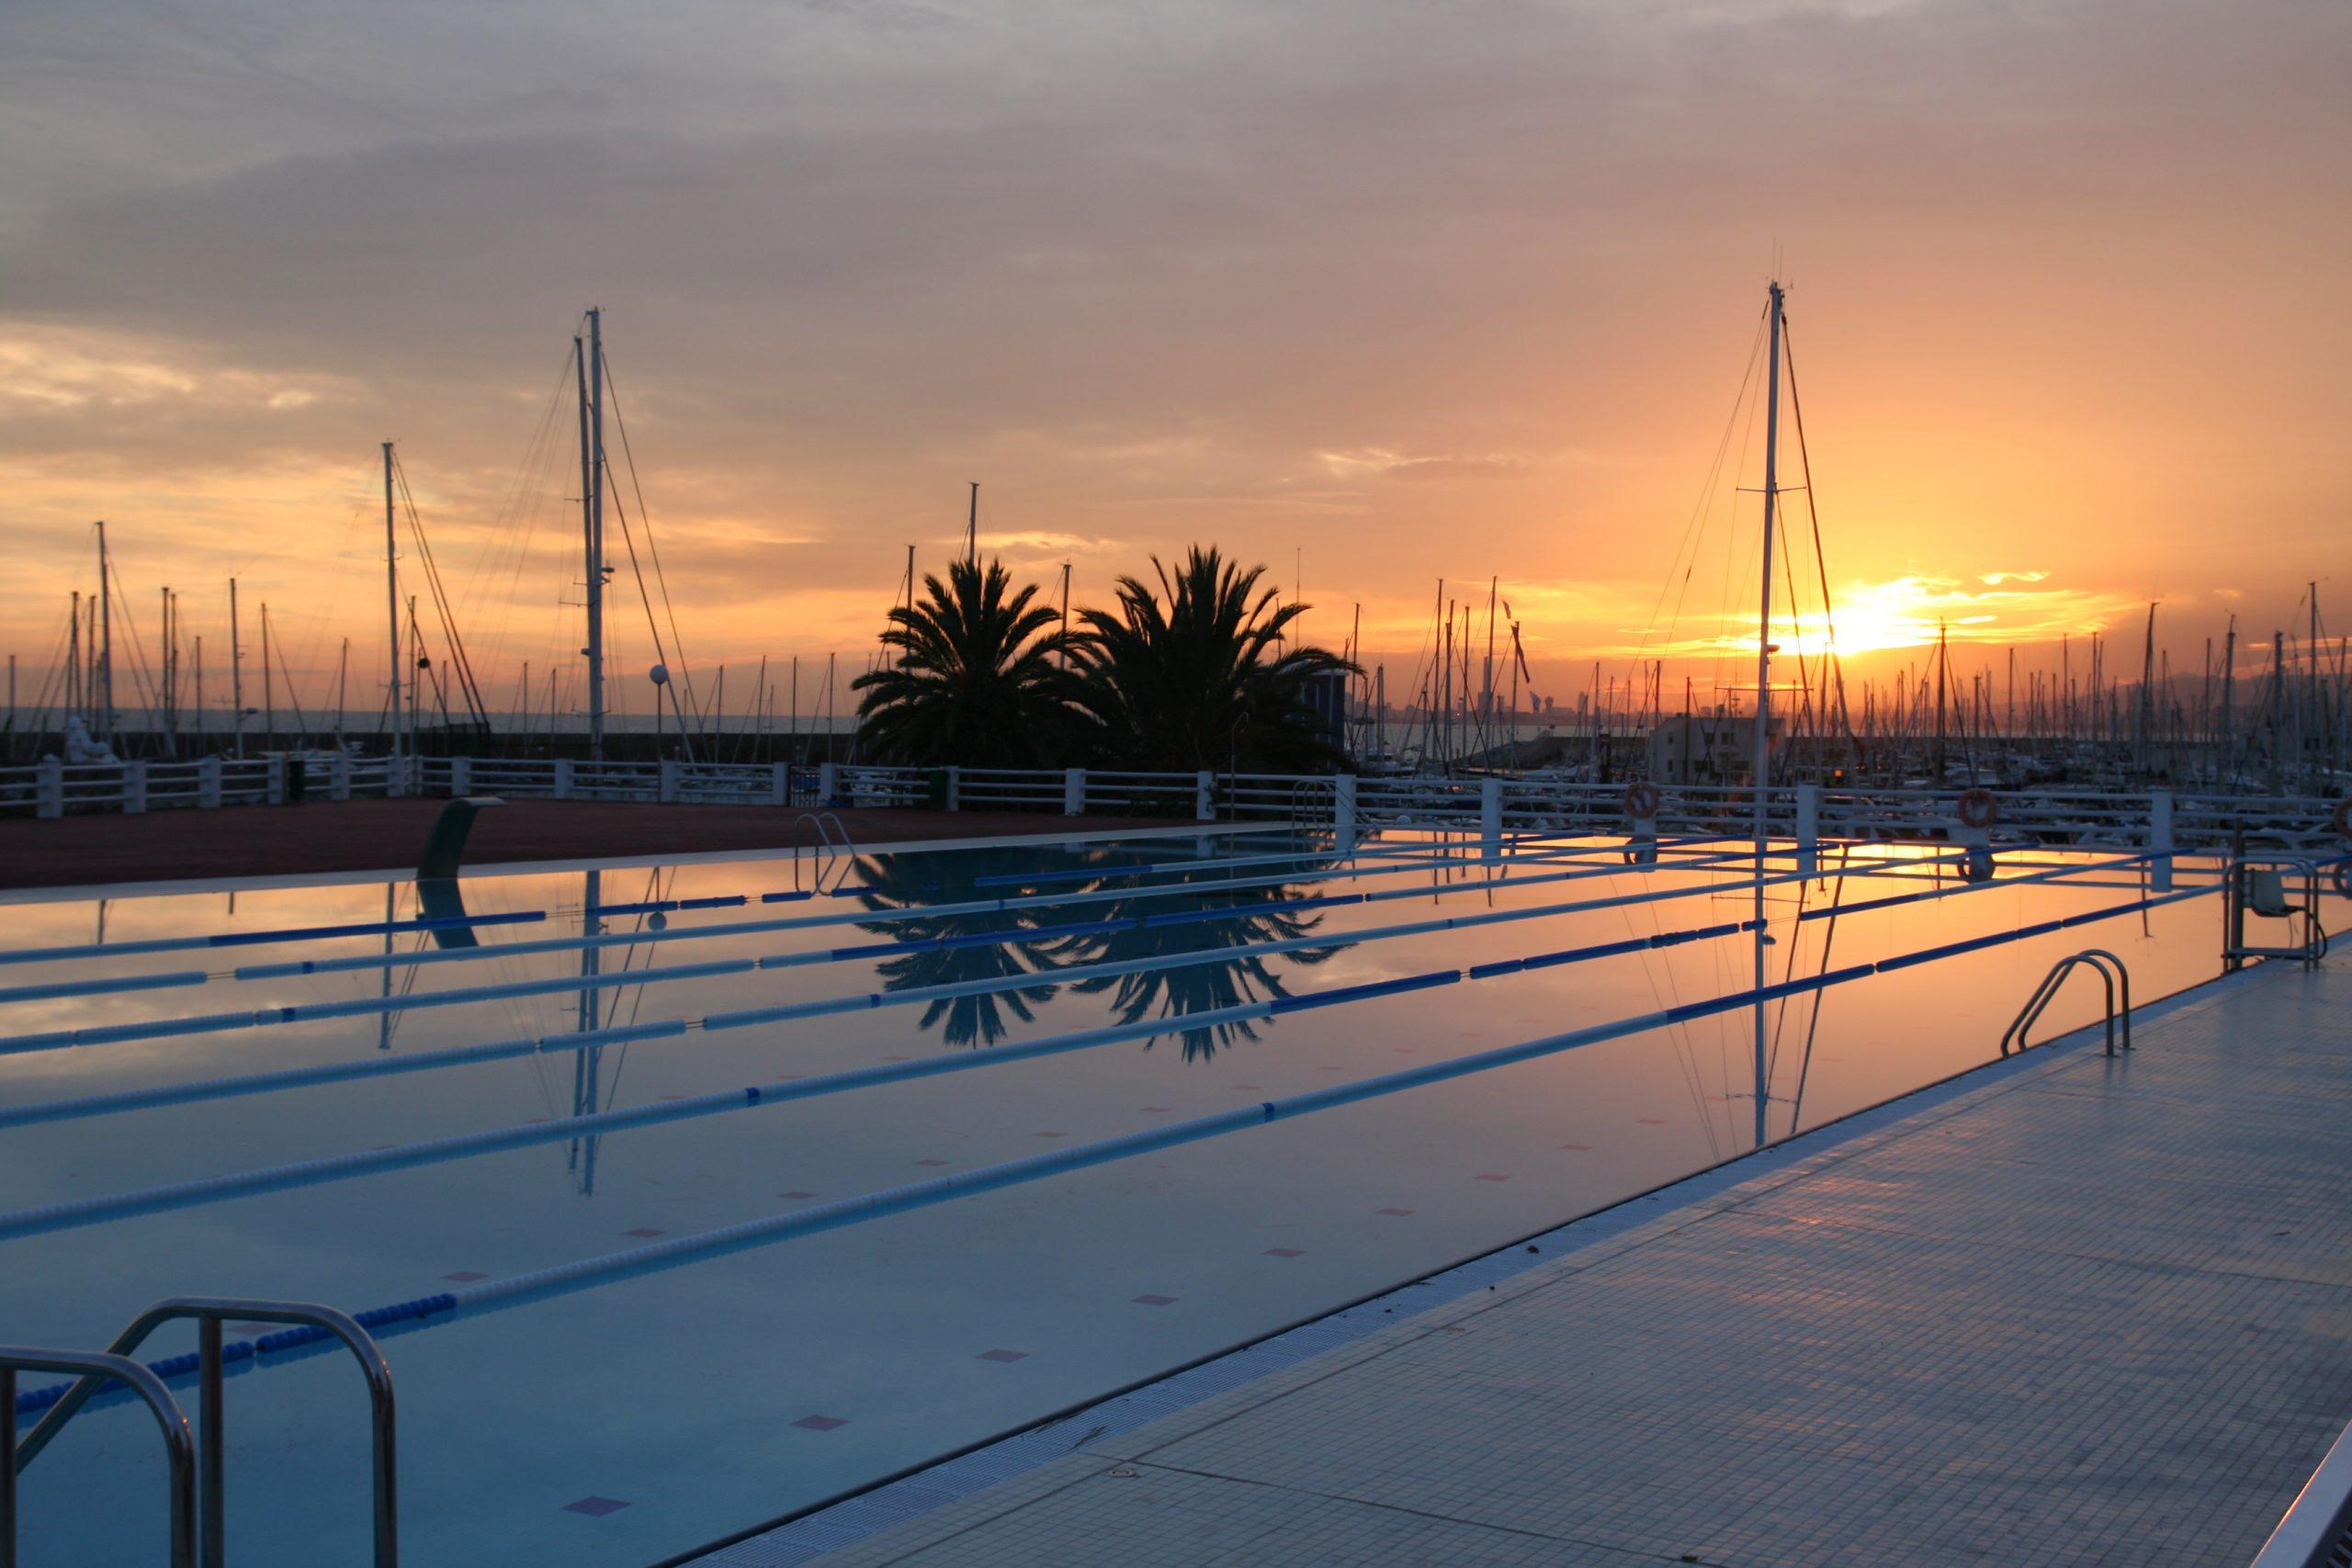 piscina, piscina exterior, nàutic, estiu, tarda, relax, instalacions